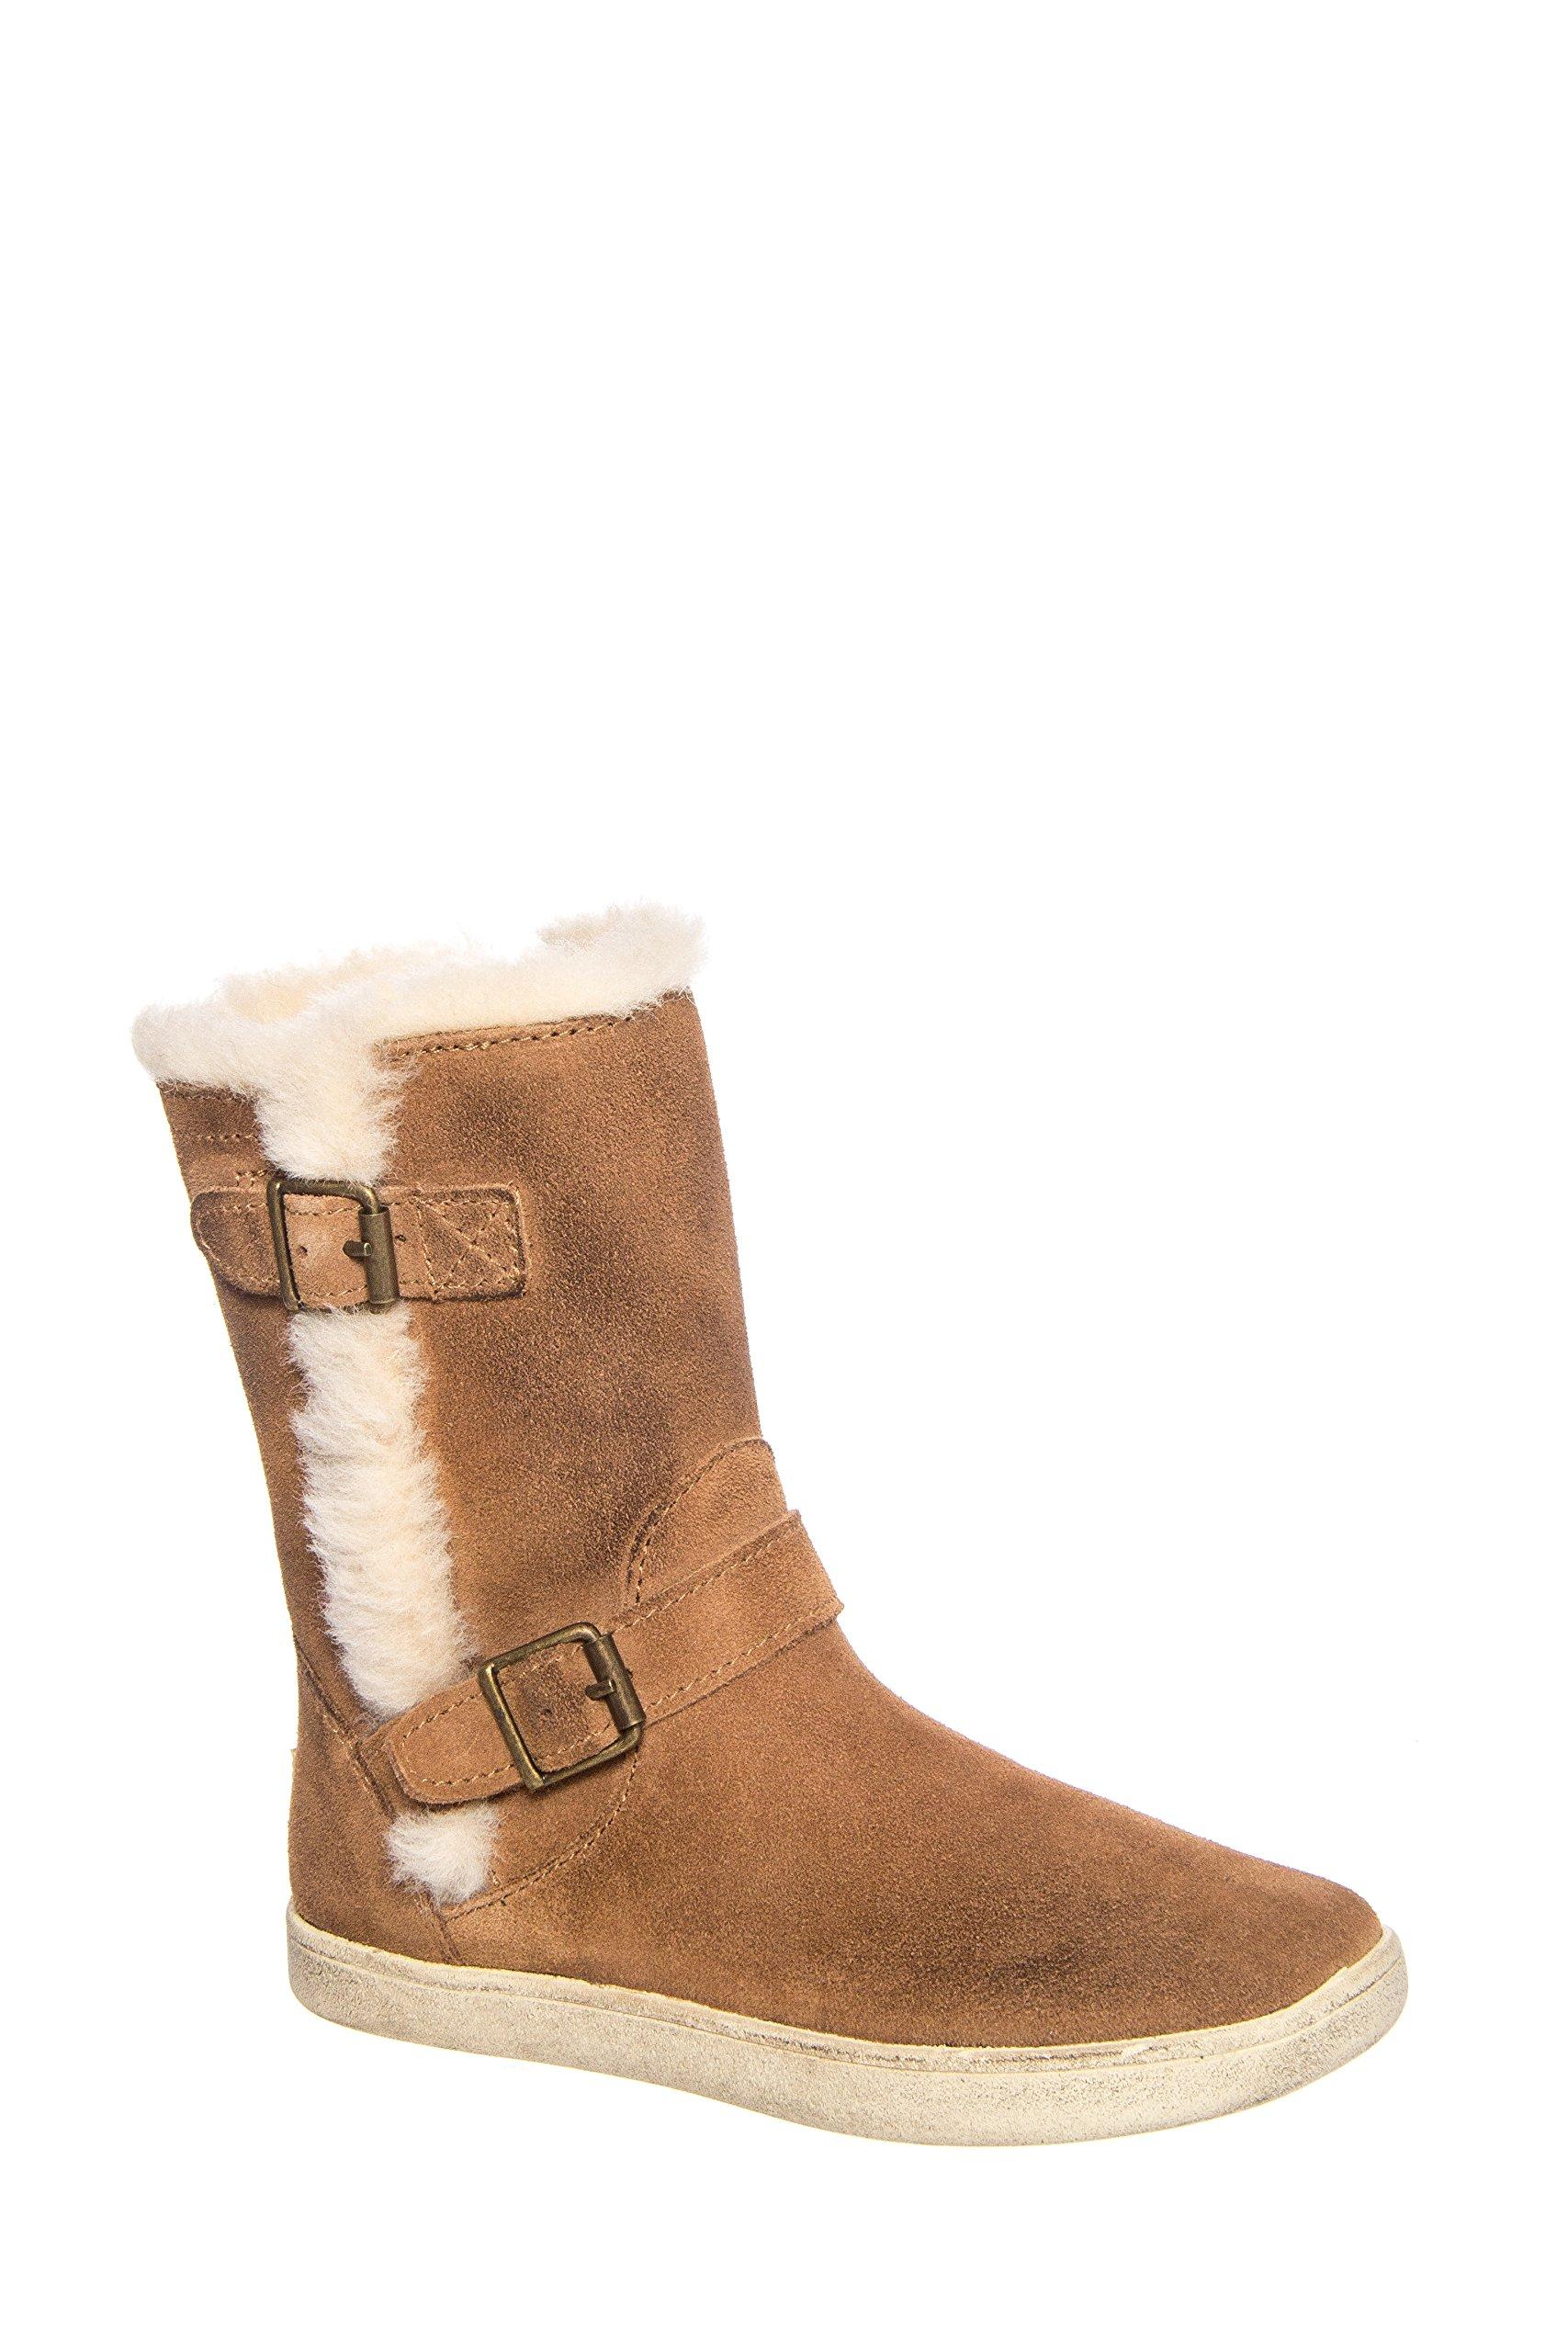 UGG Australia Girls Barley Boot Chestnut Size 4 M US Big Kid